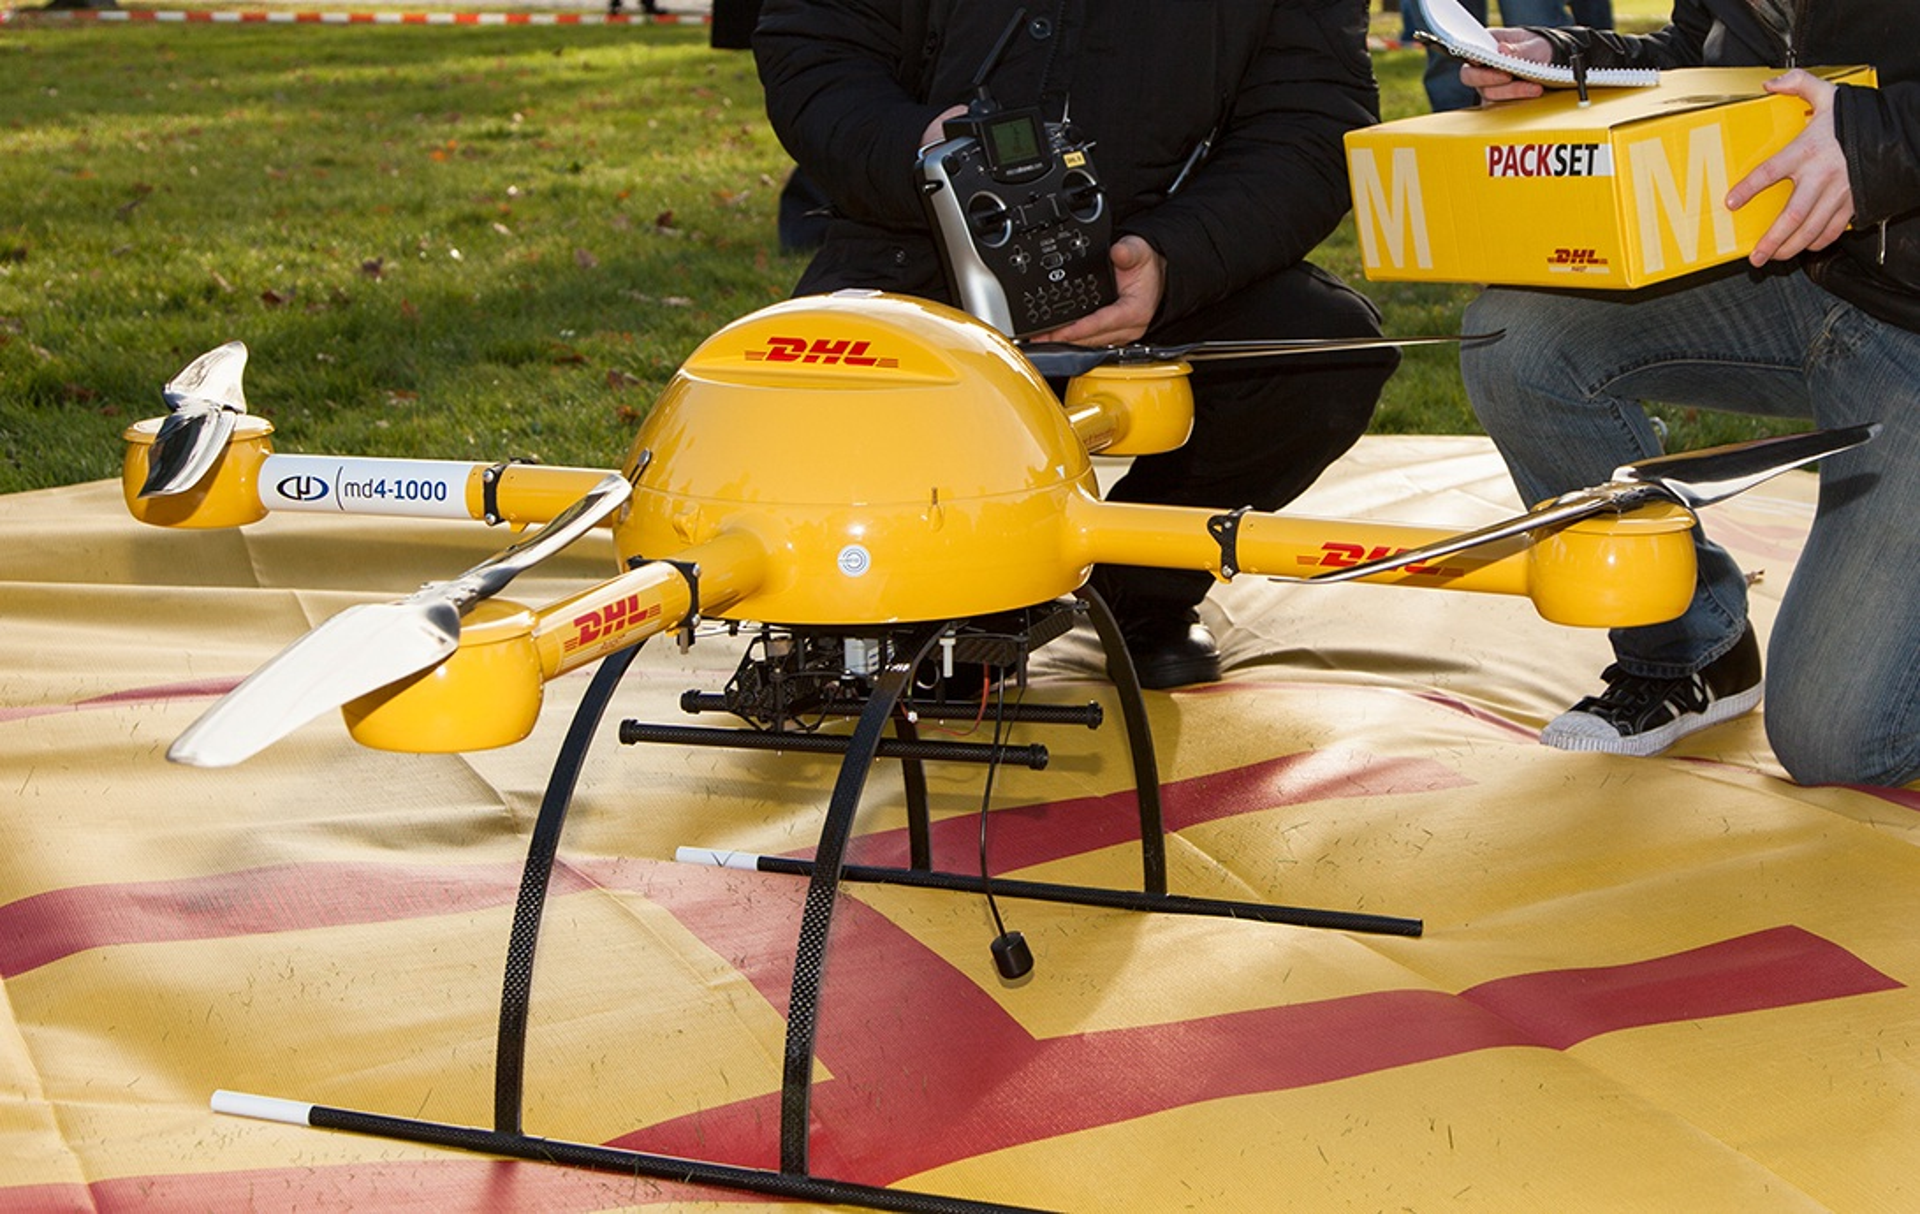 potensic drone avec caméra hd u36w rc